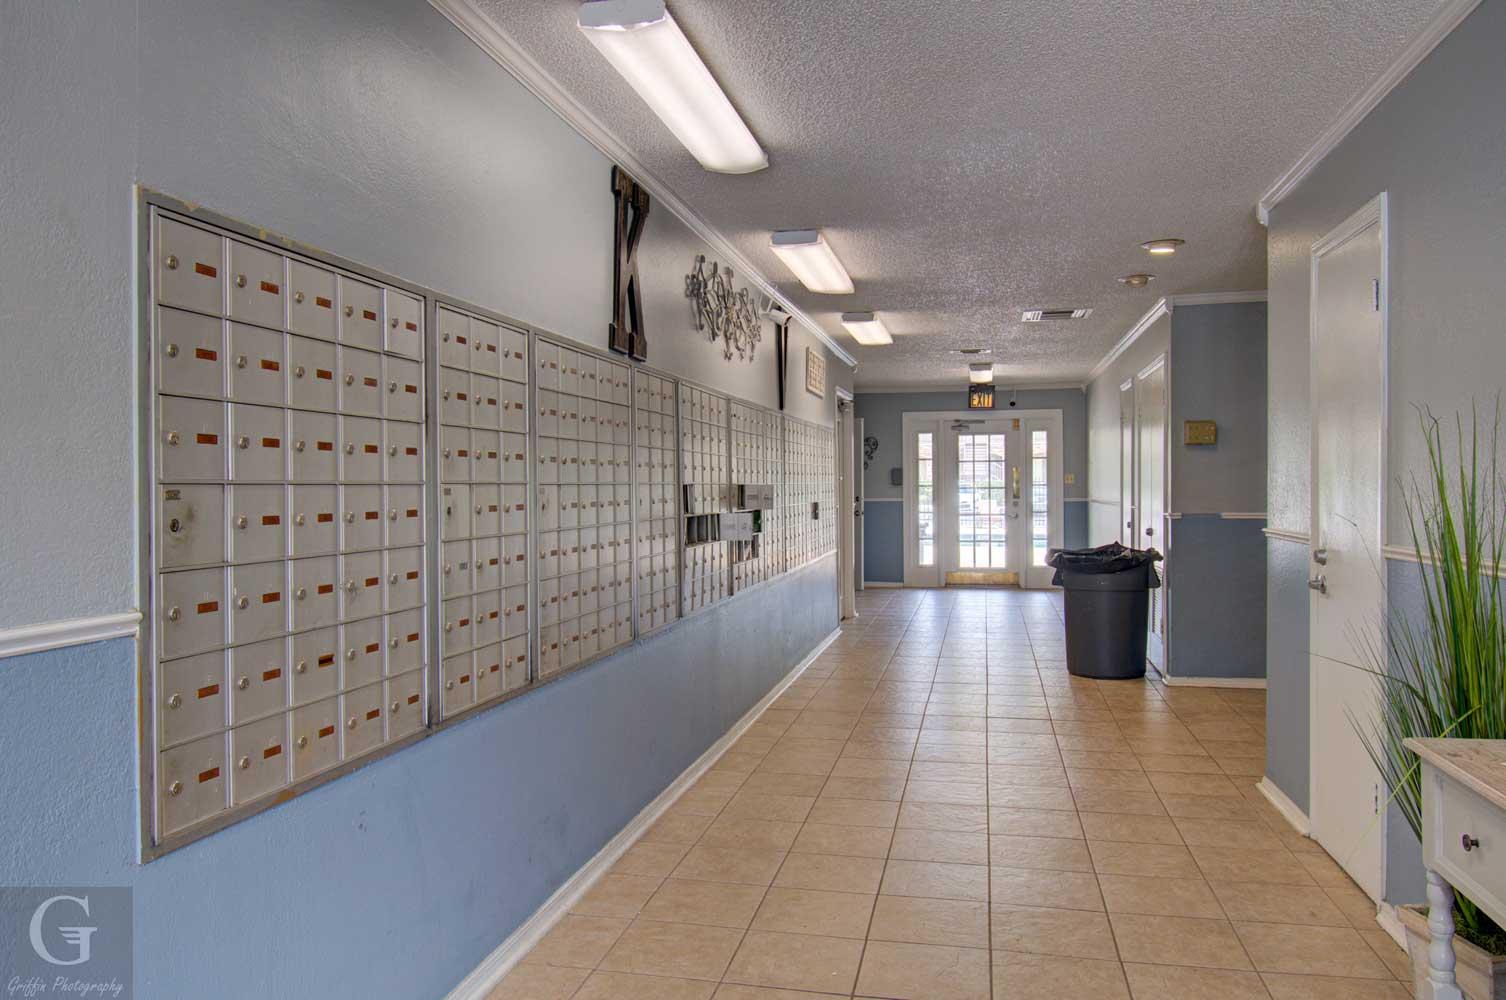 Hallway at Kingston Village Apartments in Shreveport, LA